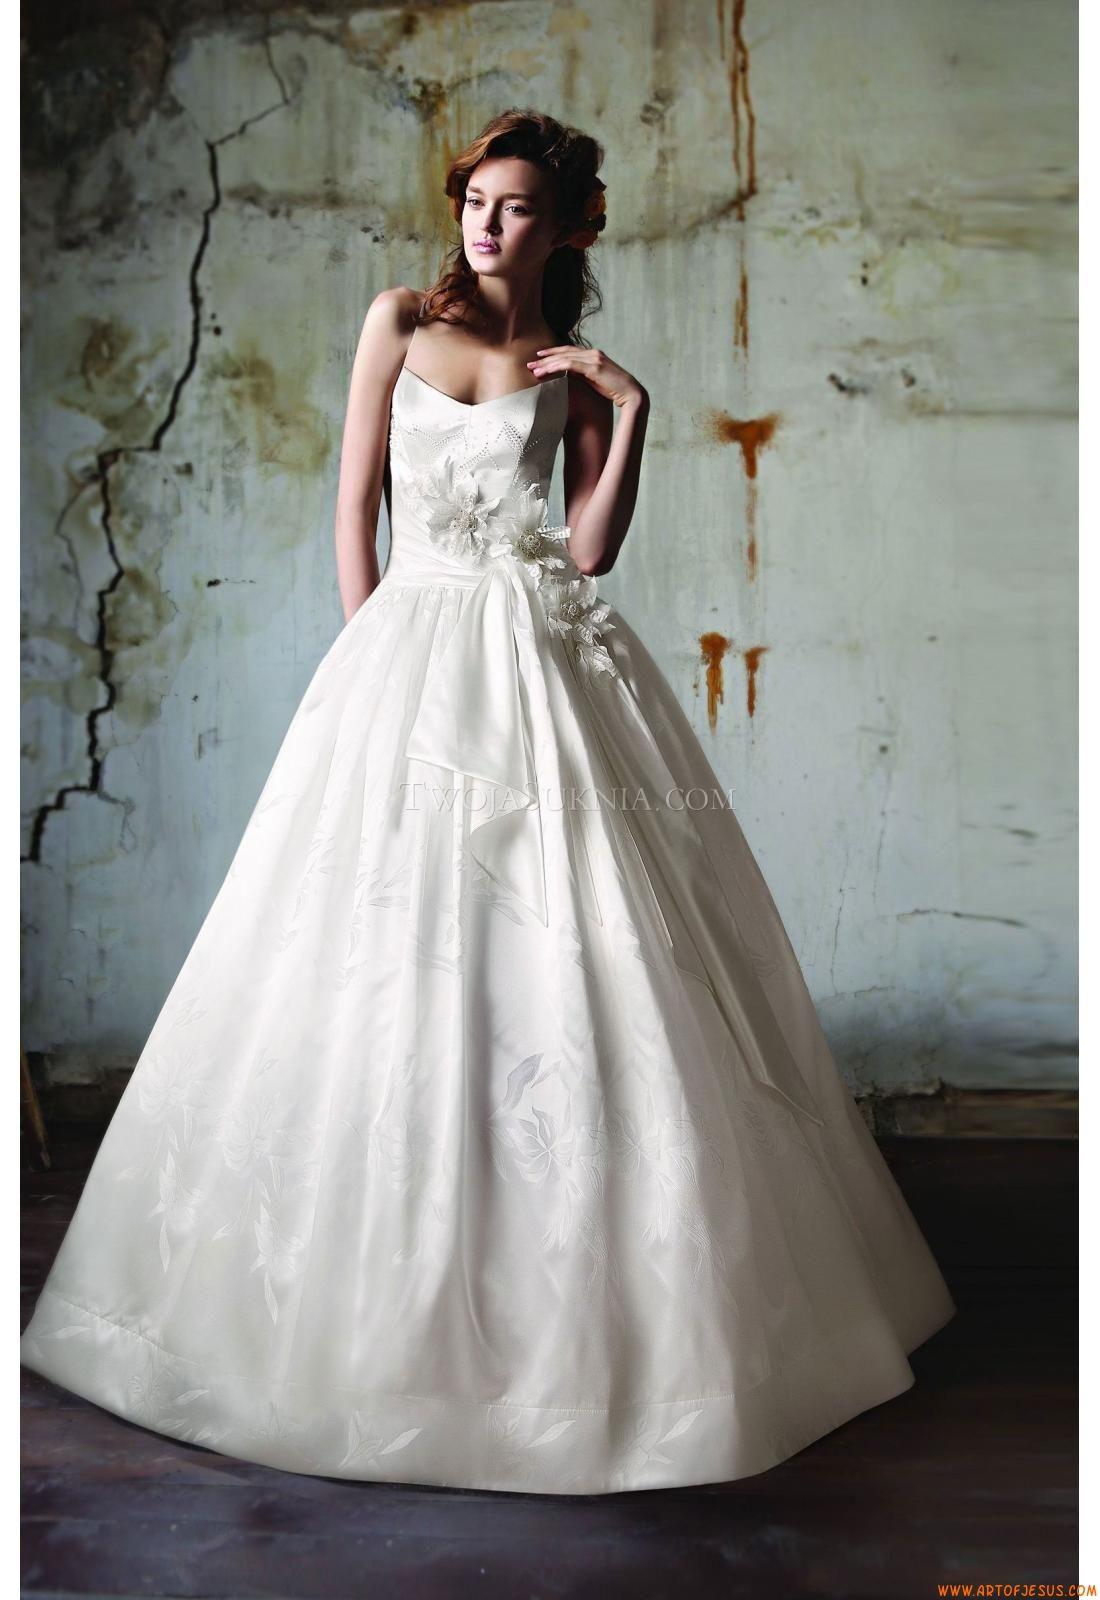 Wedding Dresses Le Rina Yustina 2012 | wedding dresses 2014 ...